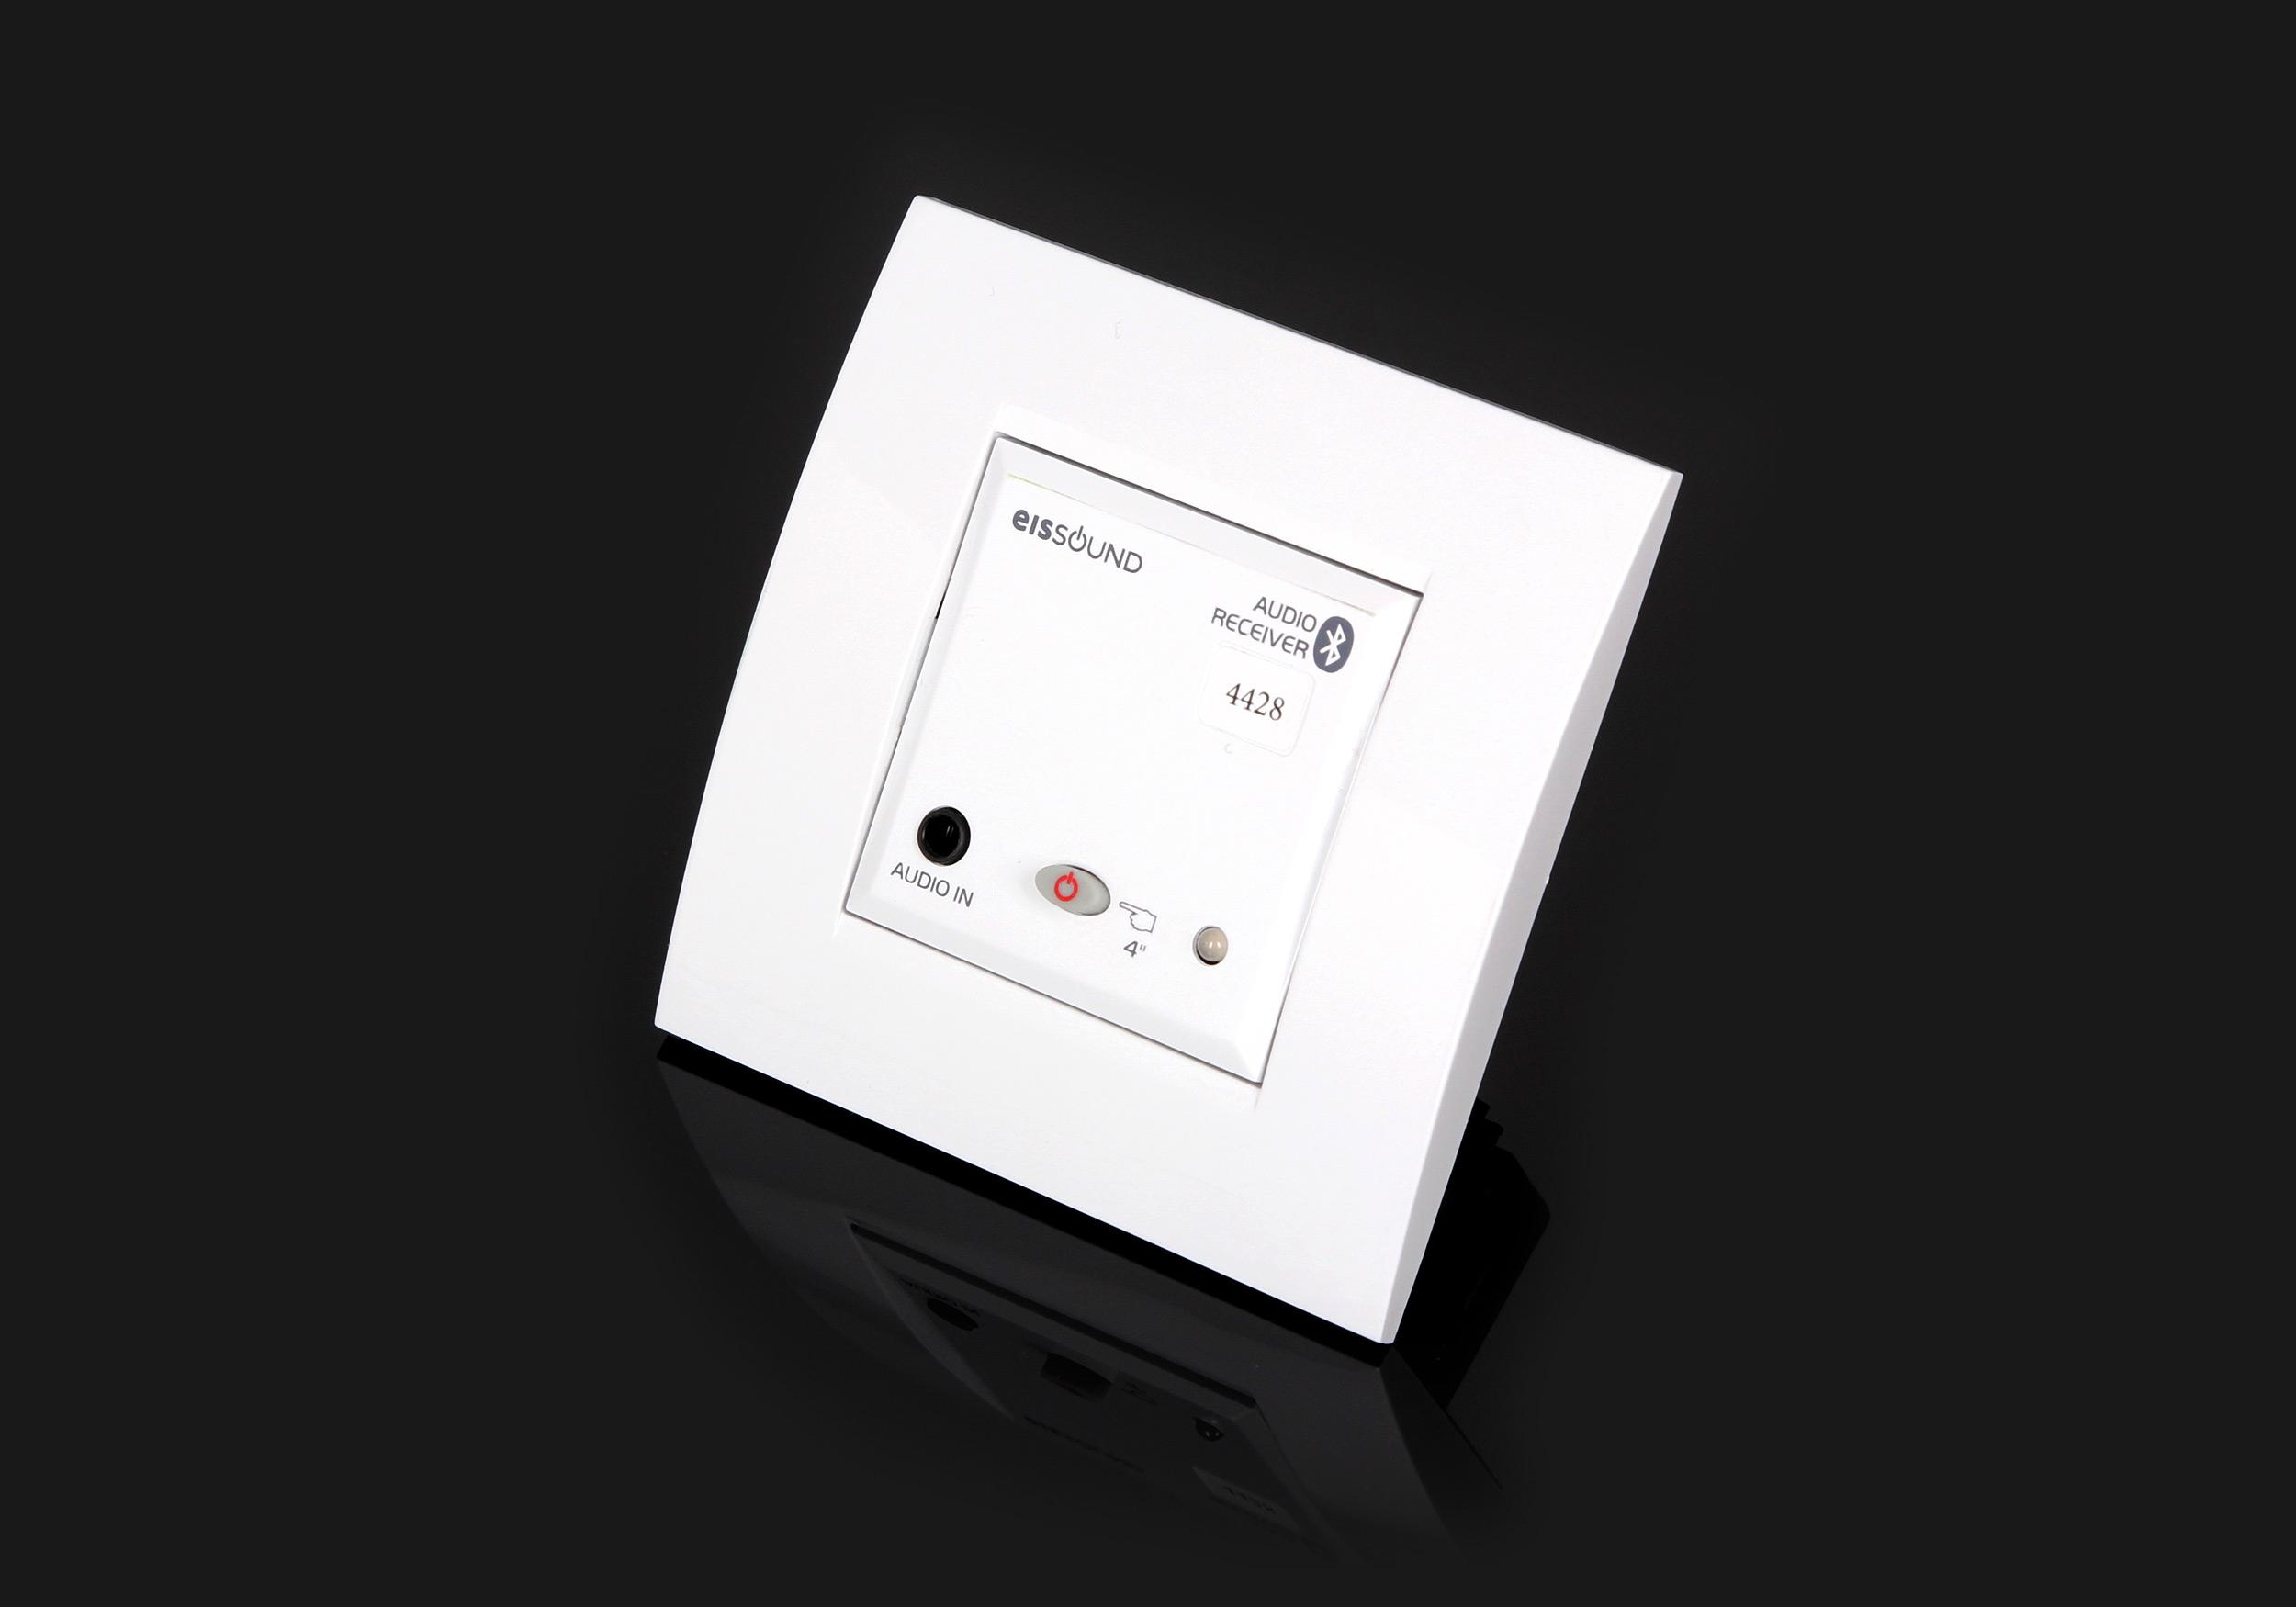 Jednostka centralna nagłośnienia Bluetooth do łazienki Eis Sound